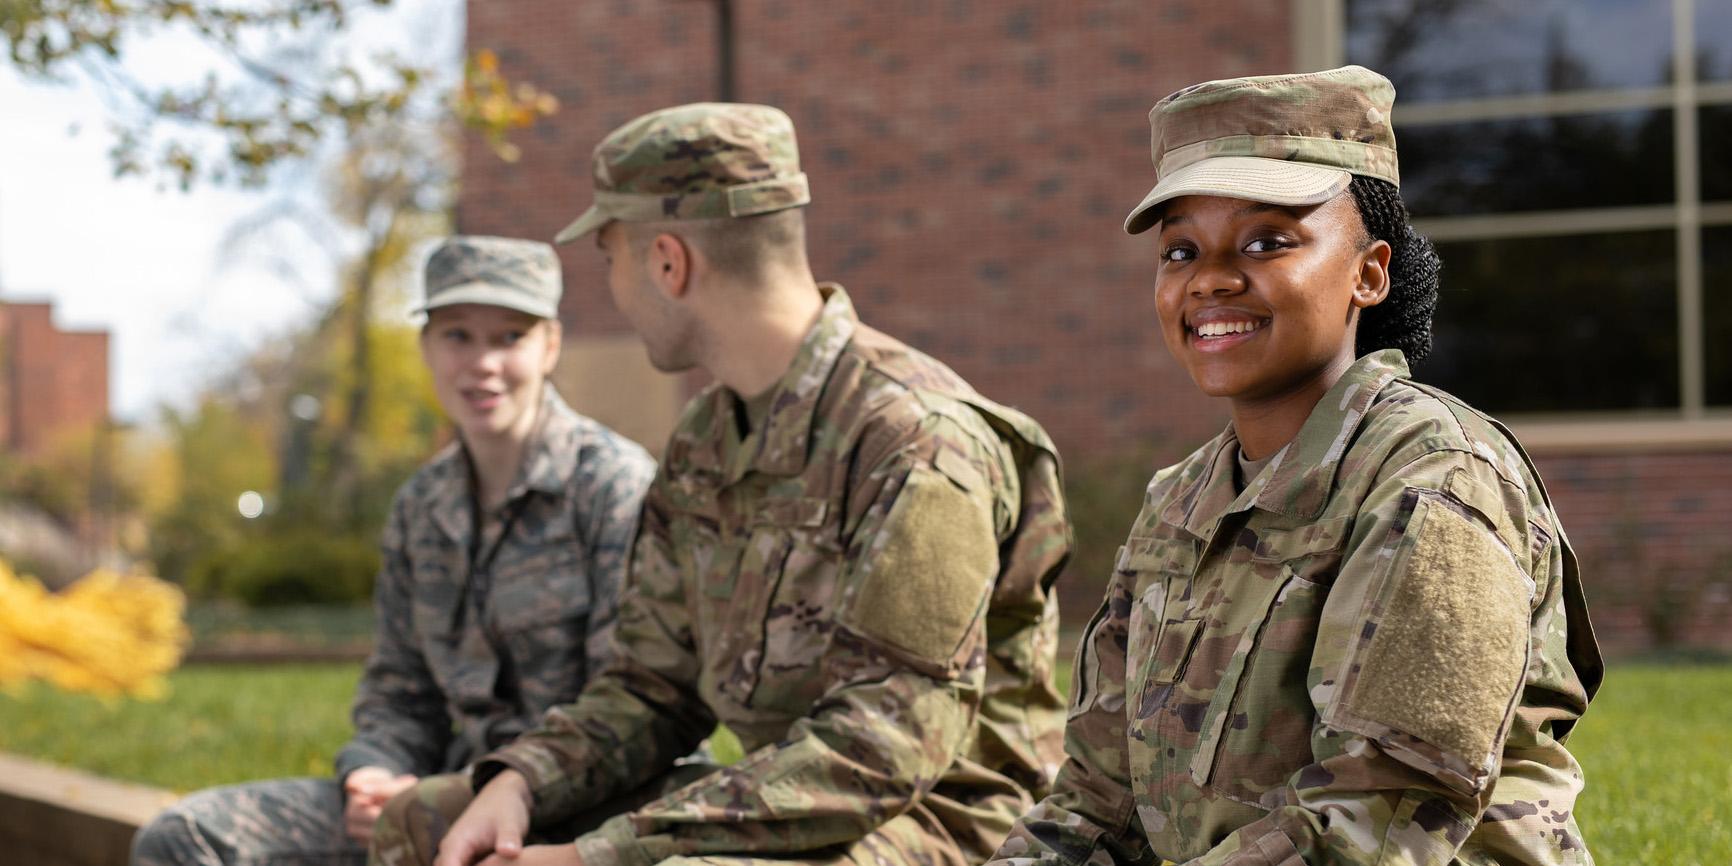 Military students at Bethel University